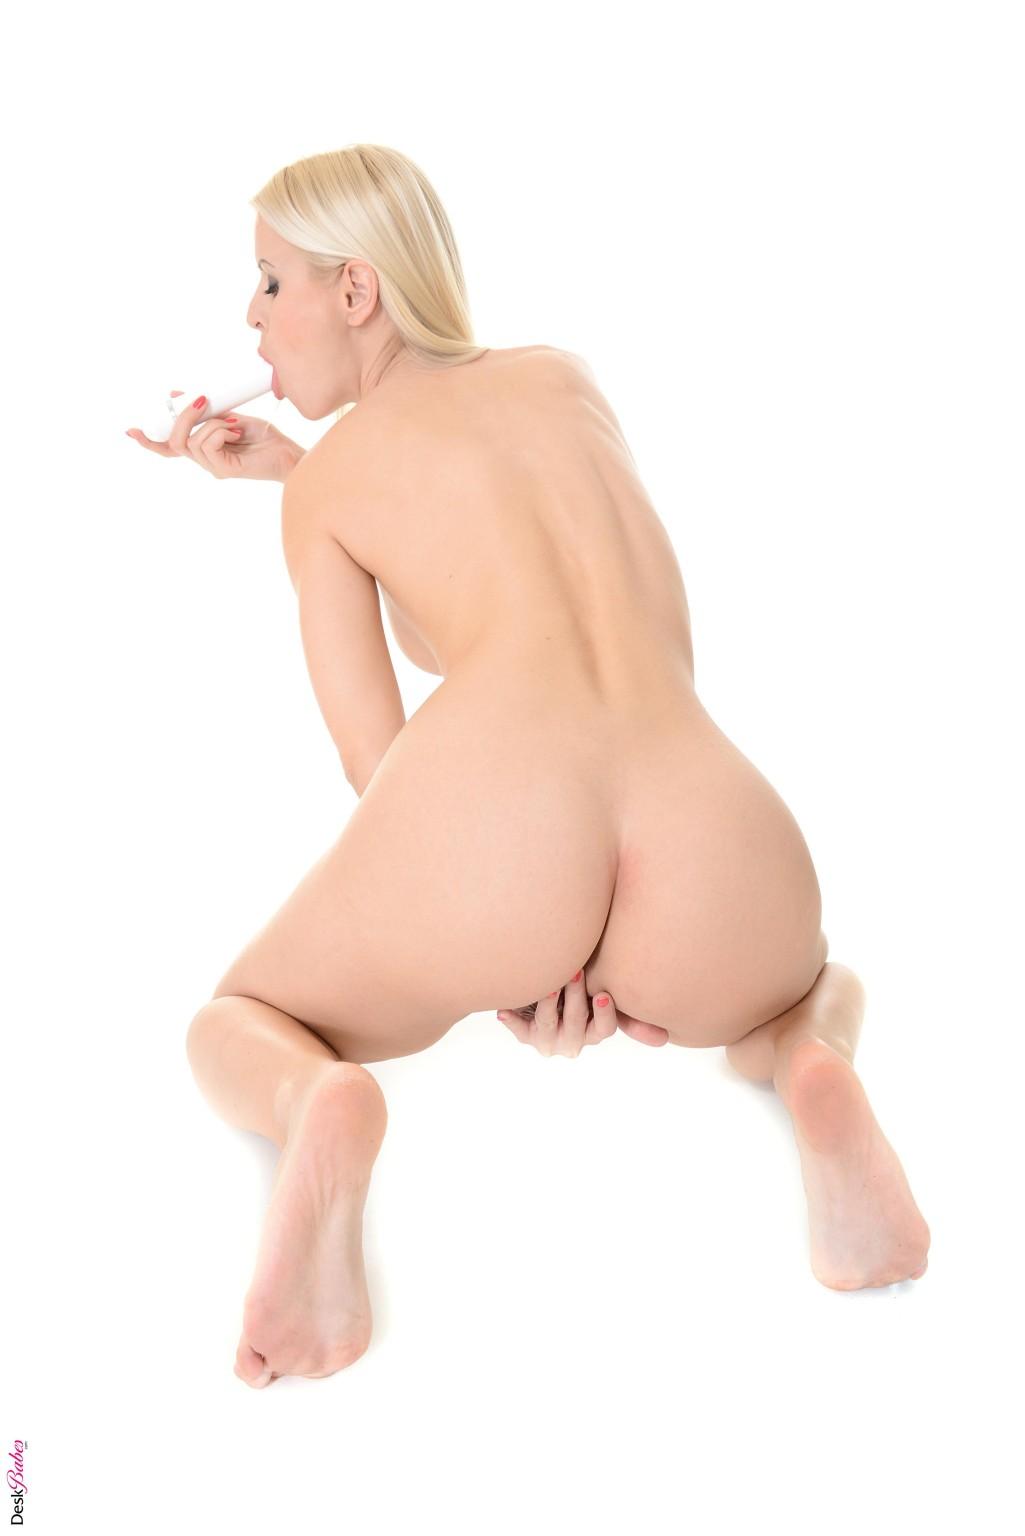 Ms Lynna, Lynna Nilsson - Секс игрушки - Порно галерея № 3466070